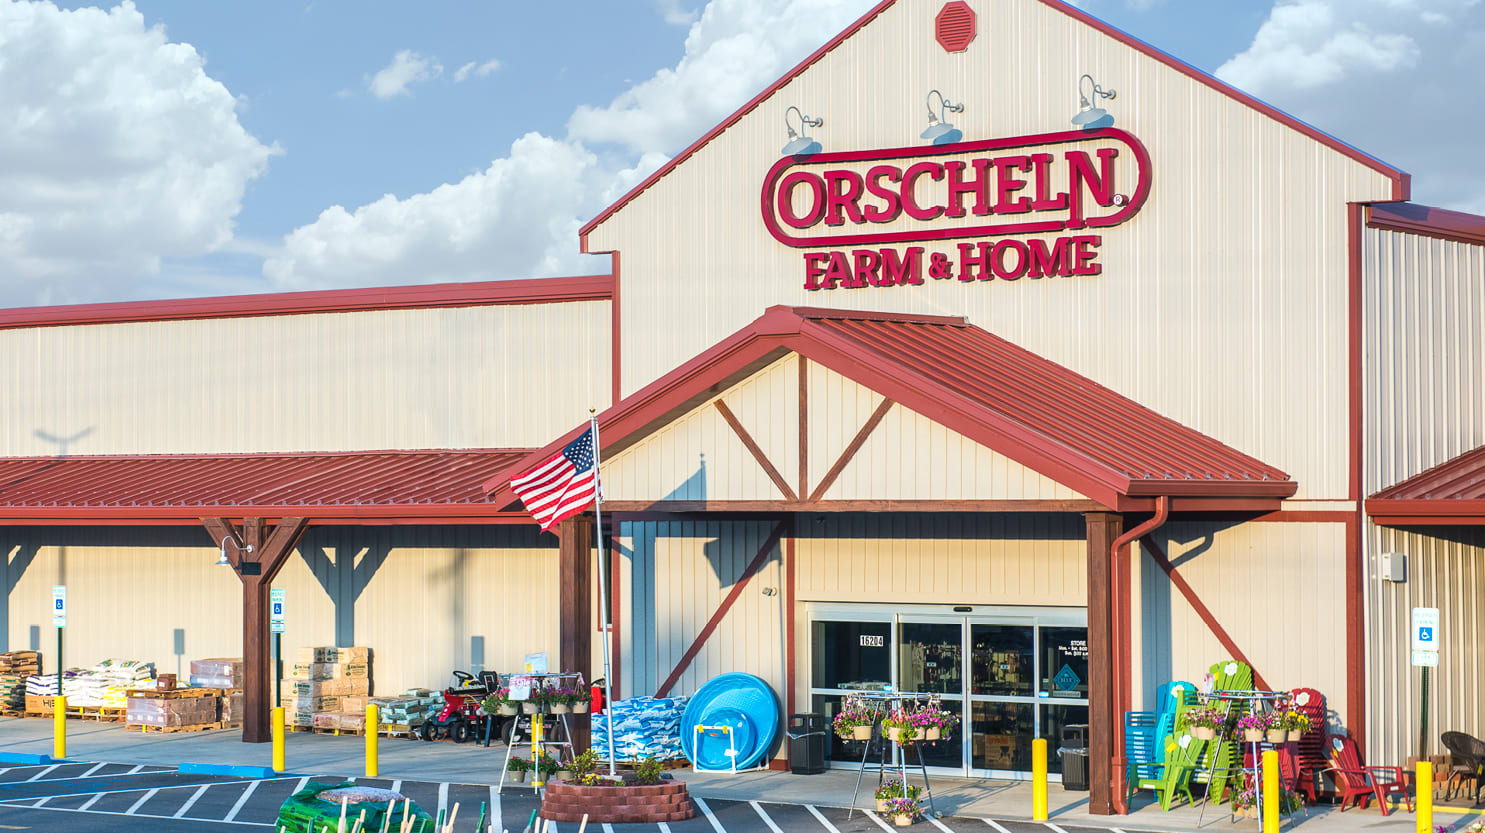 Front view of Orscheln Farm & Home Store in Mount Vernon, Missouri 65712